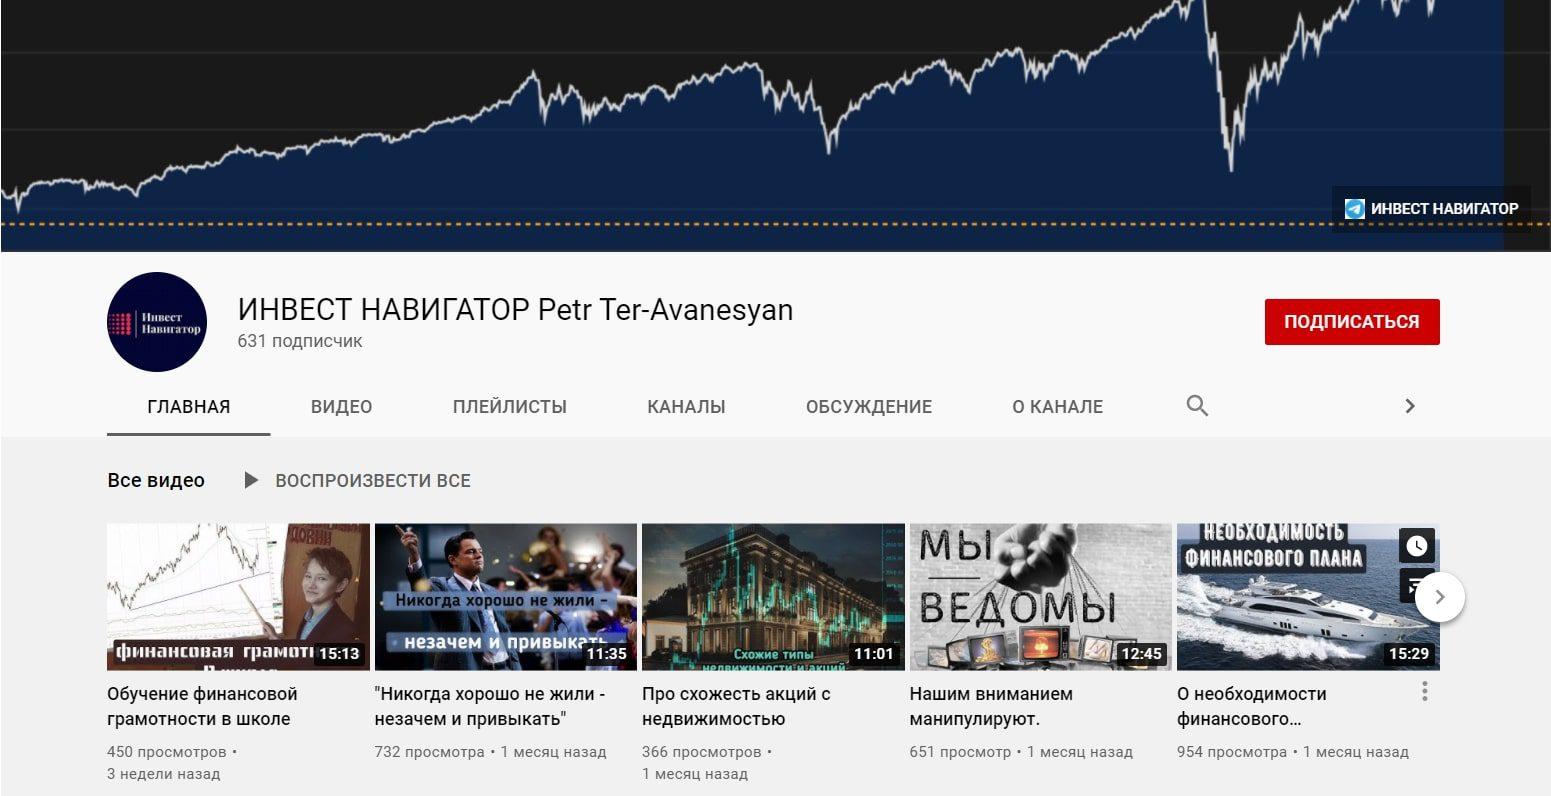 Ютуб канал Инвест Навигатор